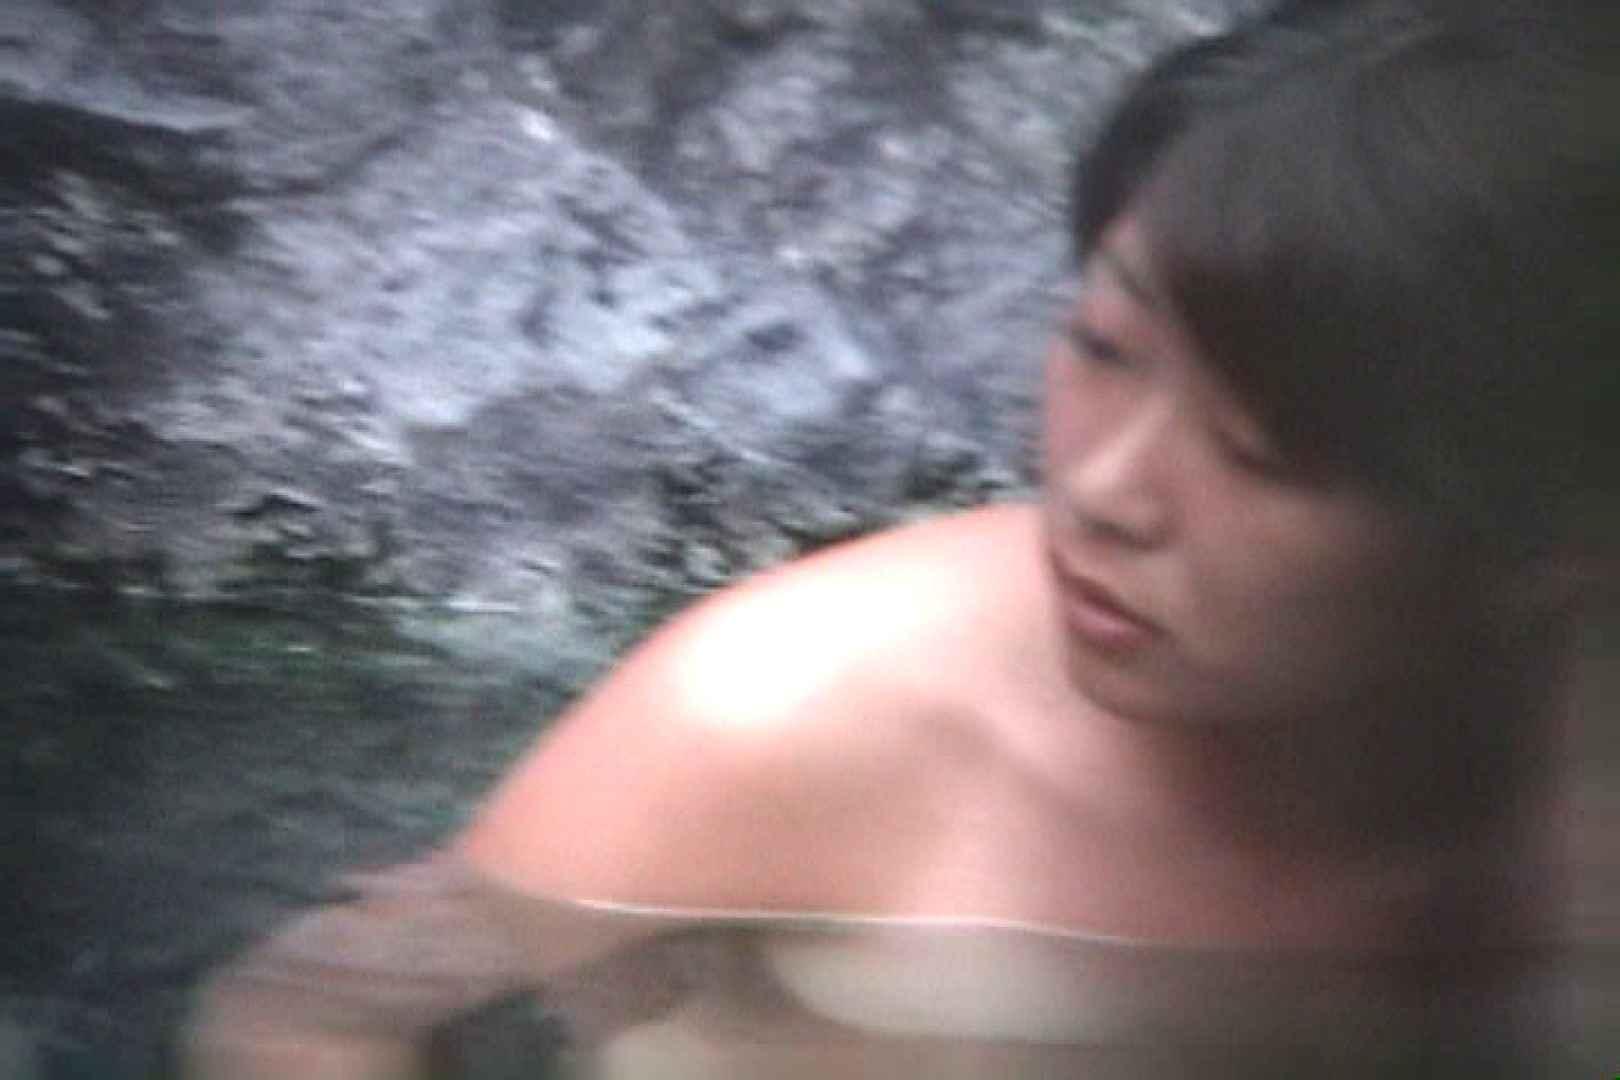 Aquaな露天風呂Vol.69【VIP限定】 盗撮 アダルト動画キャプチャ 106連発 23